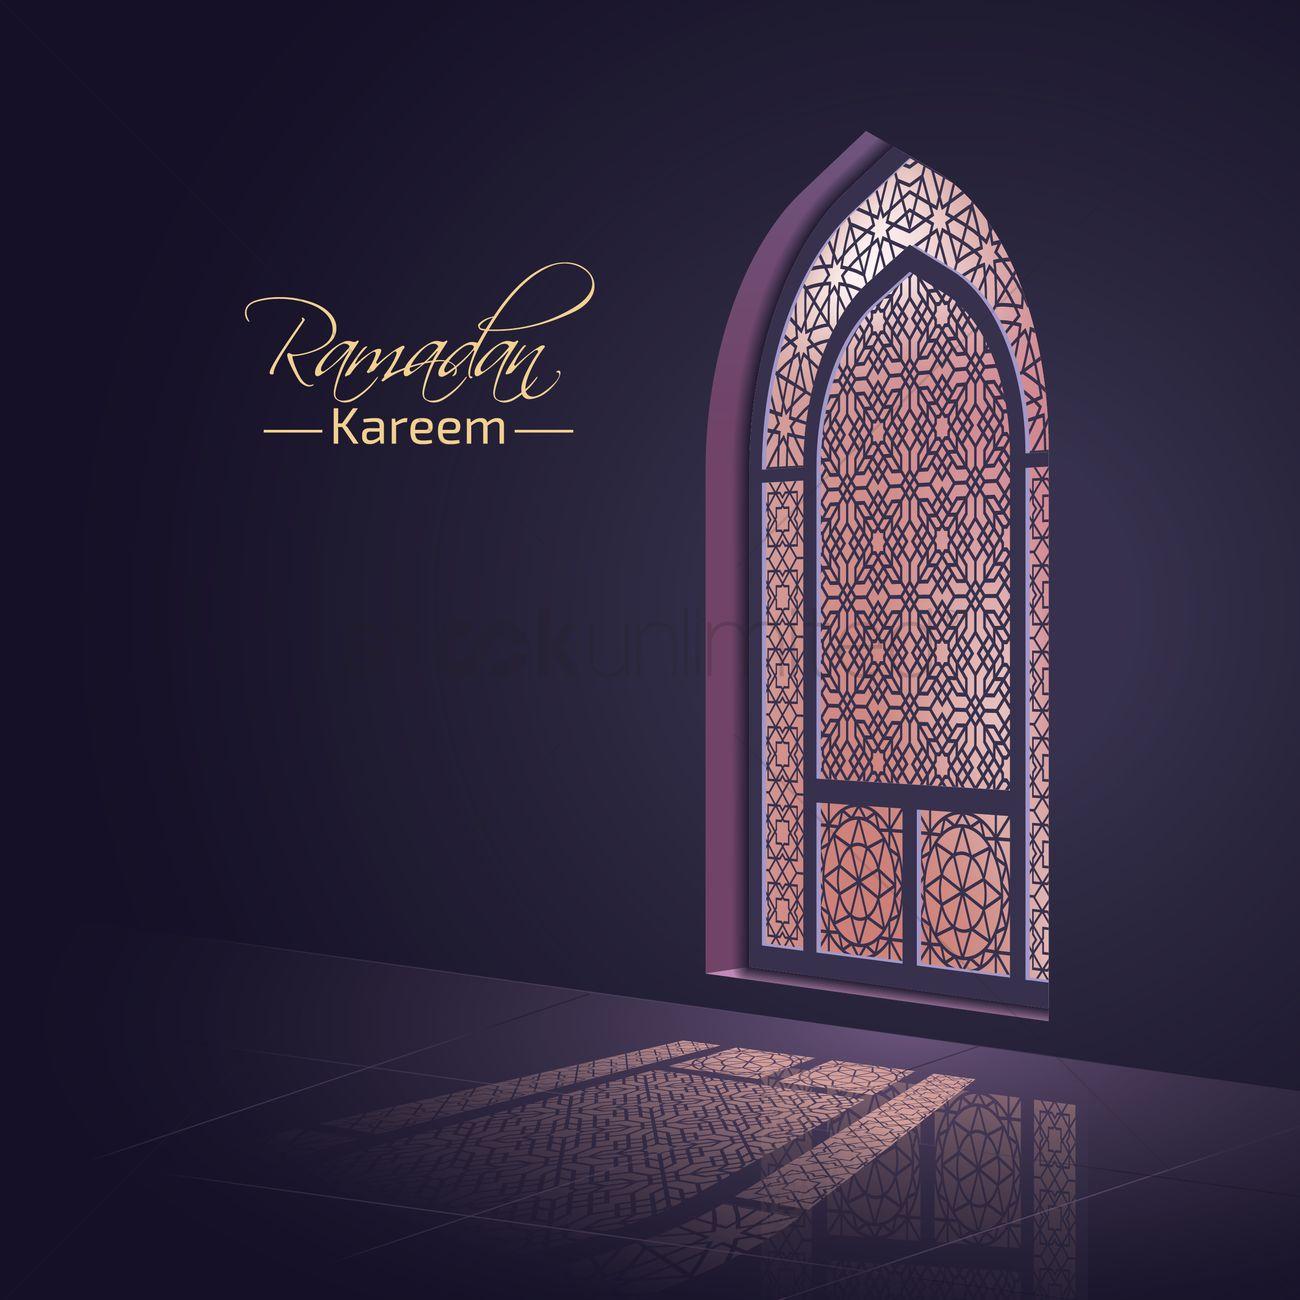 Ramadan Kareem Greeting Vector Image 1826922 Stockunlimited